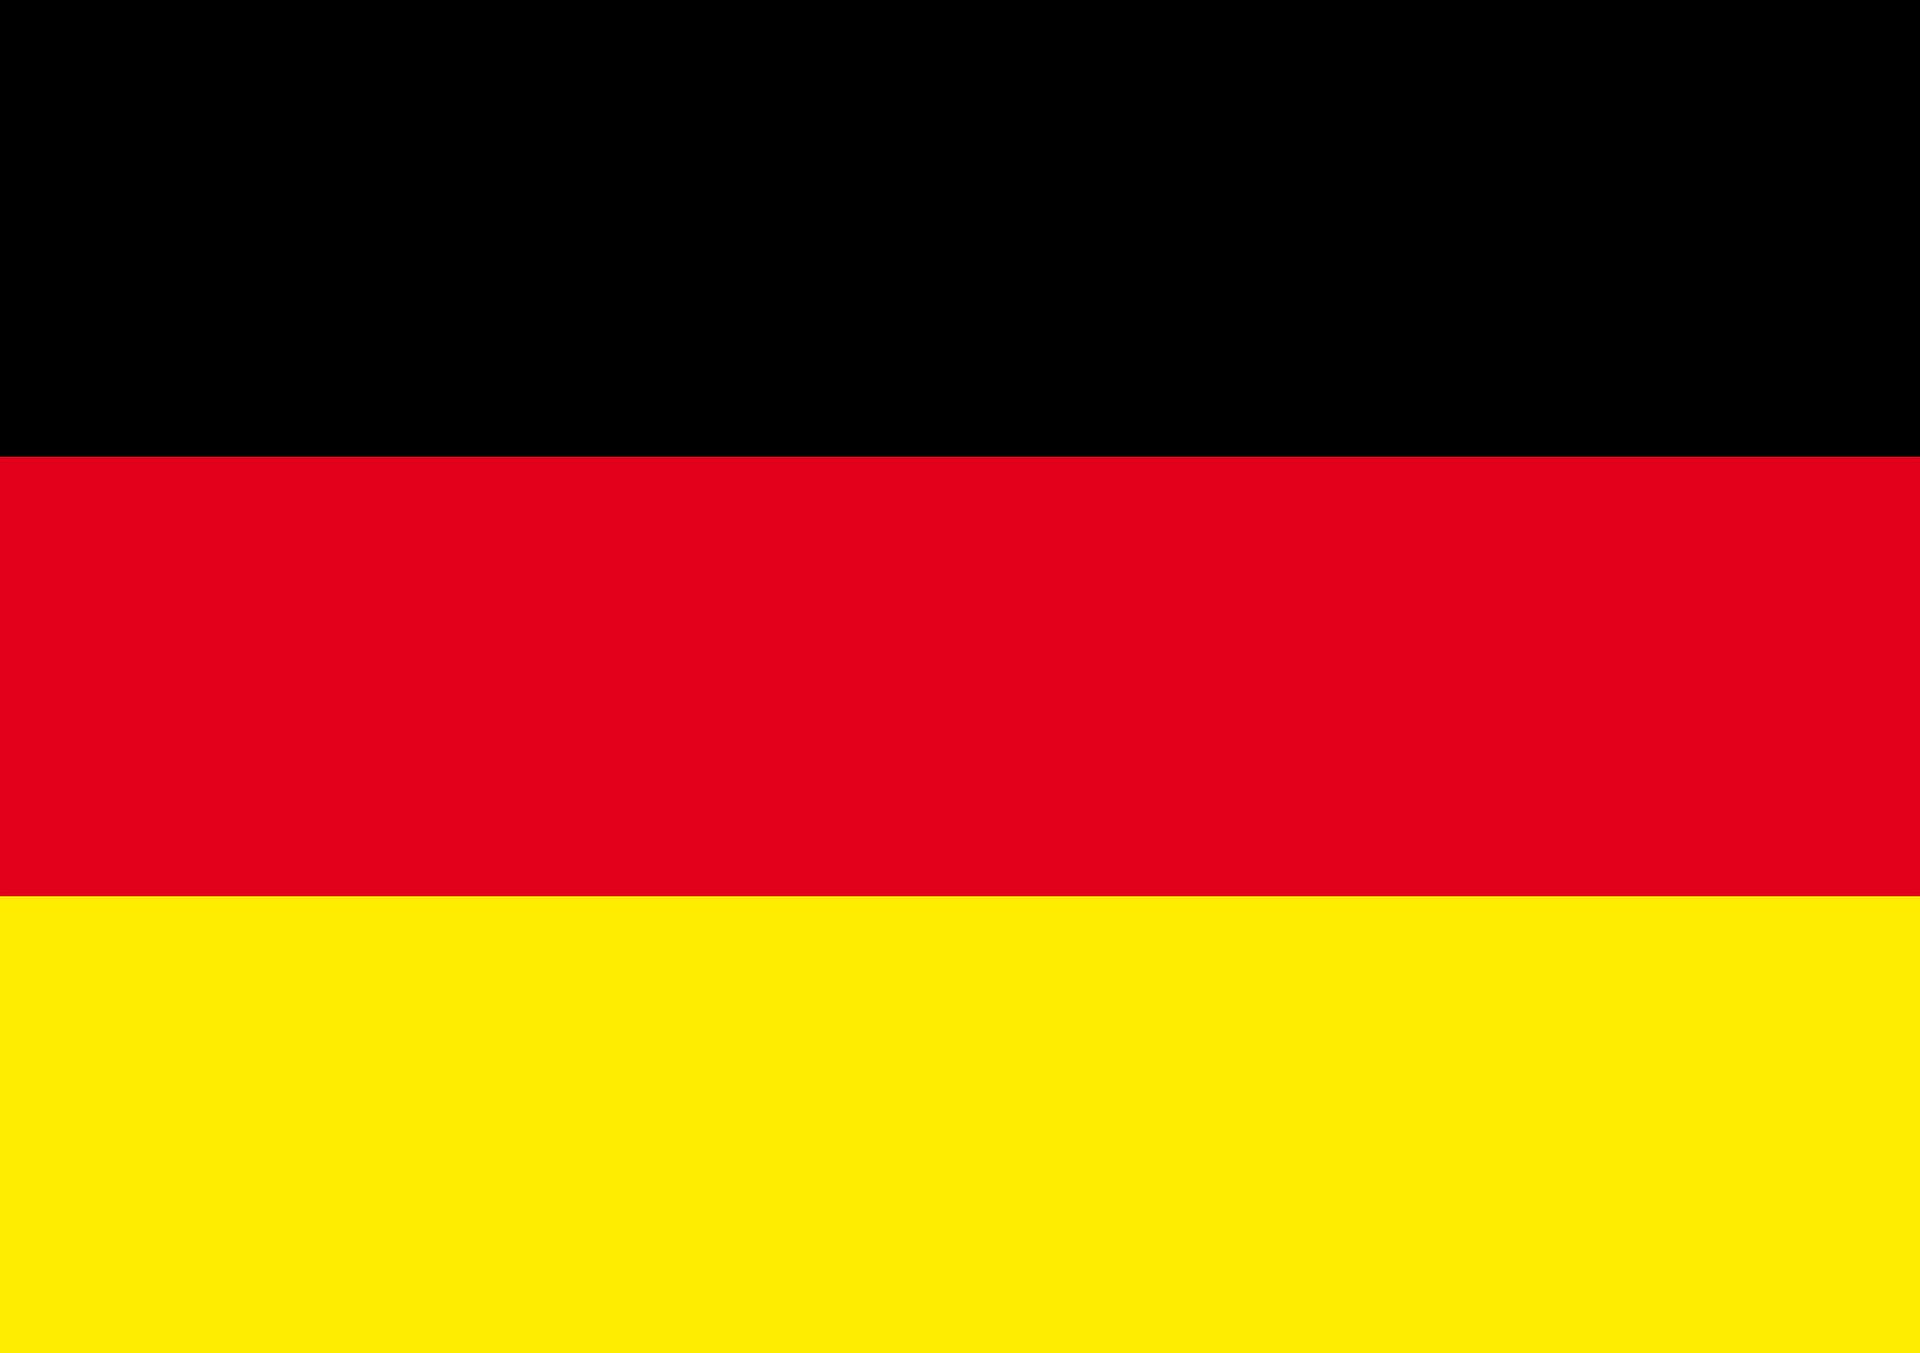 European Charter of San Gimignano German flag